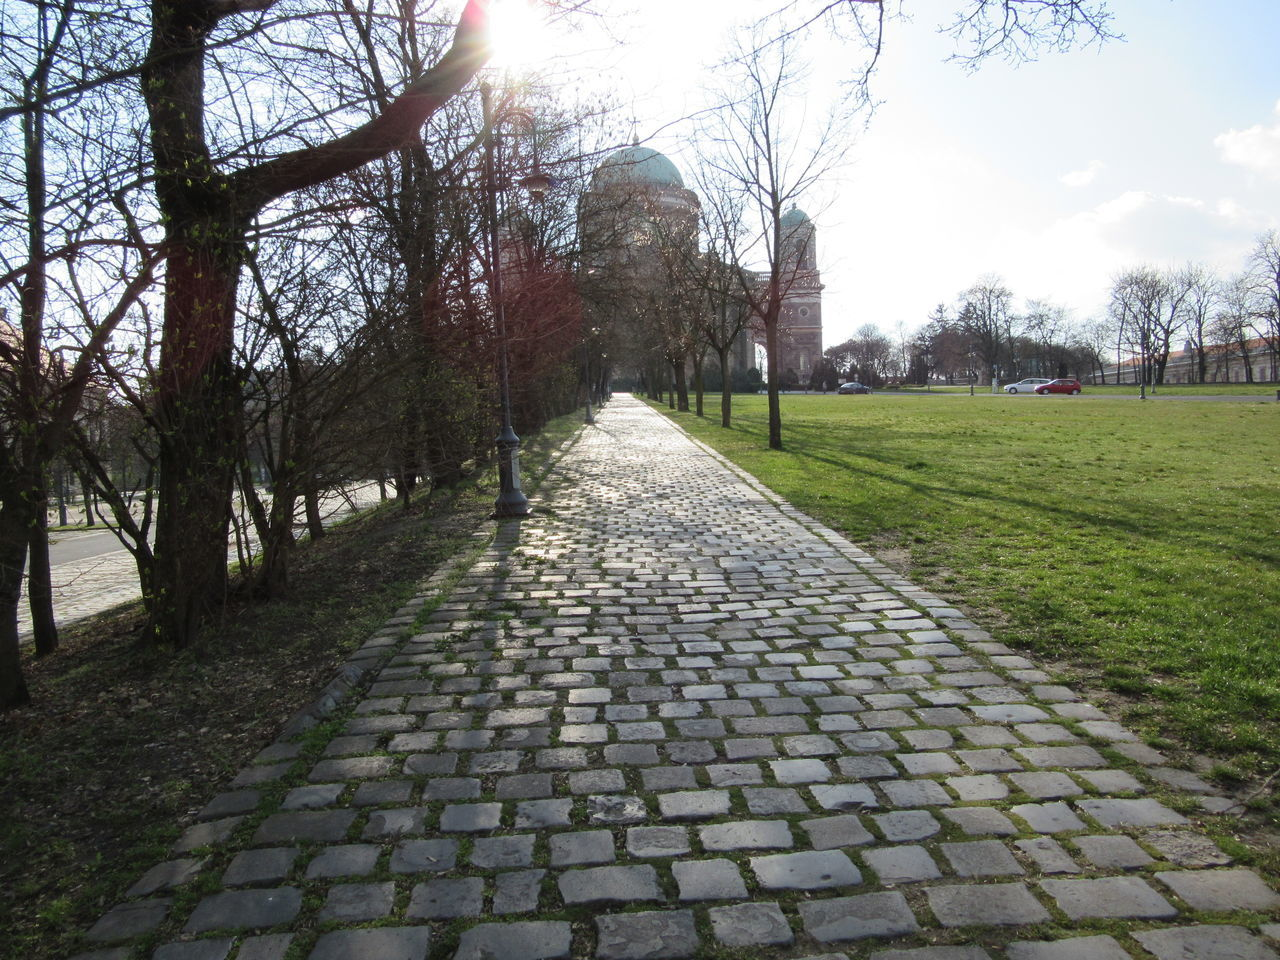 Budding Tree Cobblestone Empty Places Extinct Footpath Grass Outdoors Park Road Sidewalks Sunlight